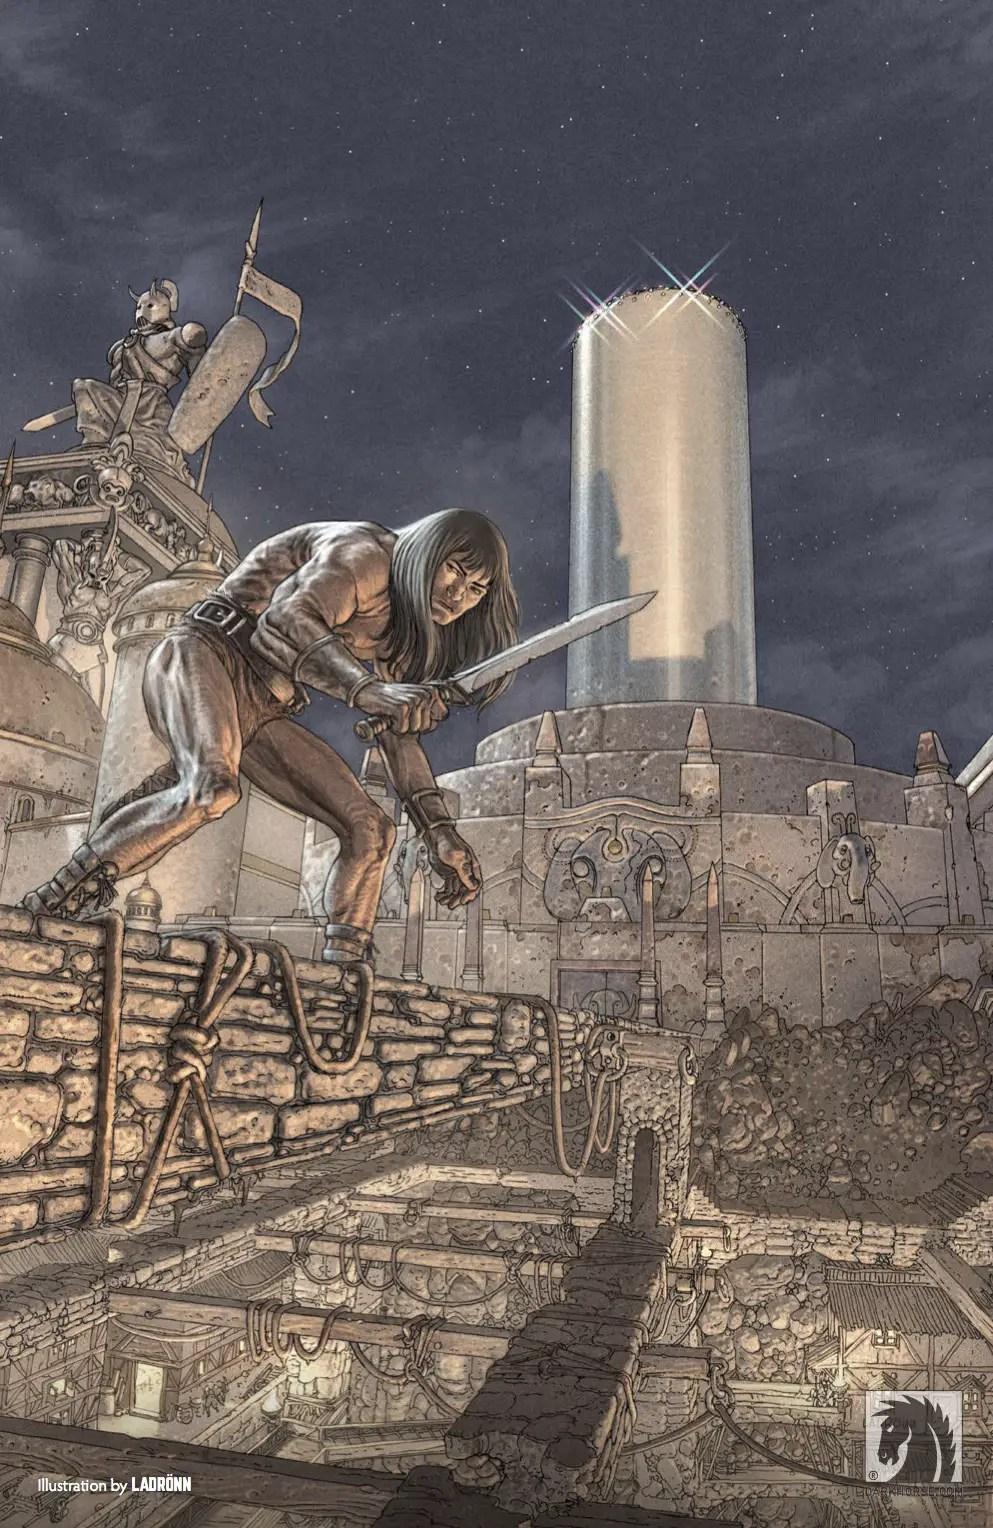 Conan Omnibus Vol. 2: City of Thieves Review